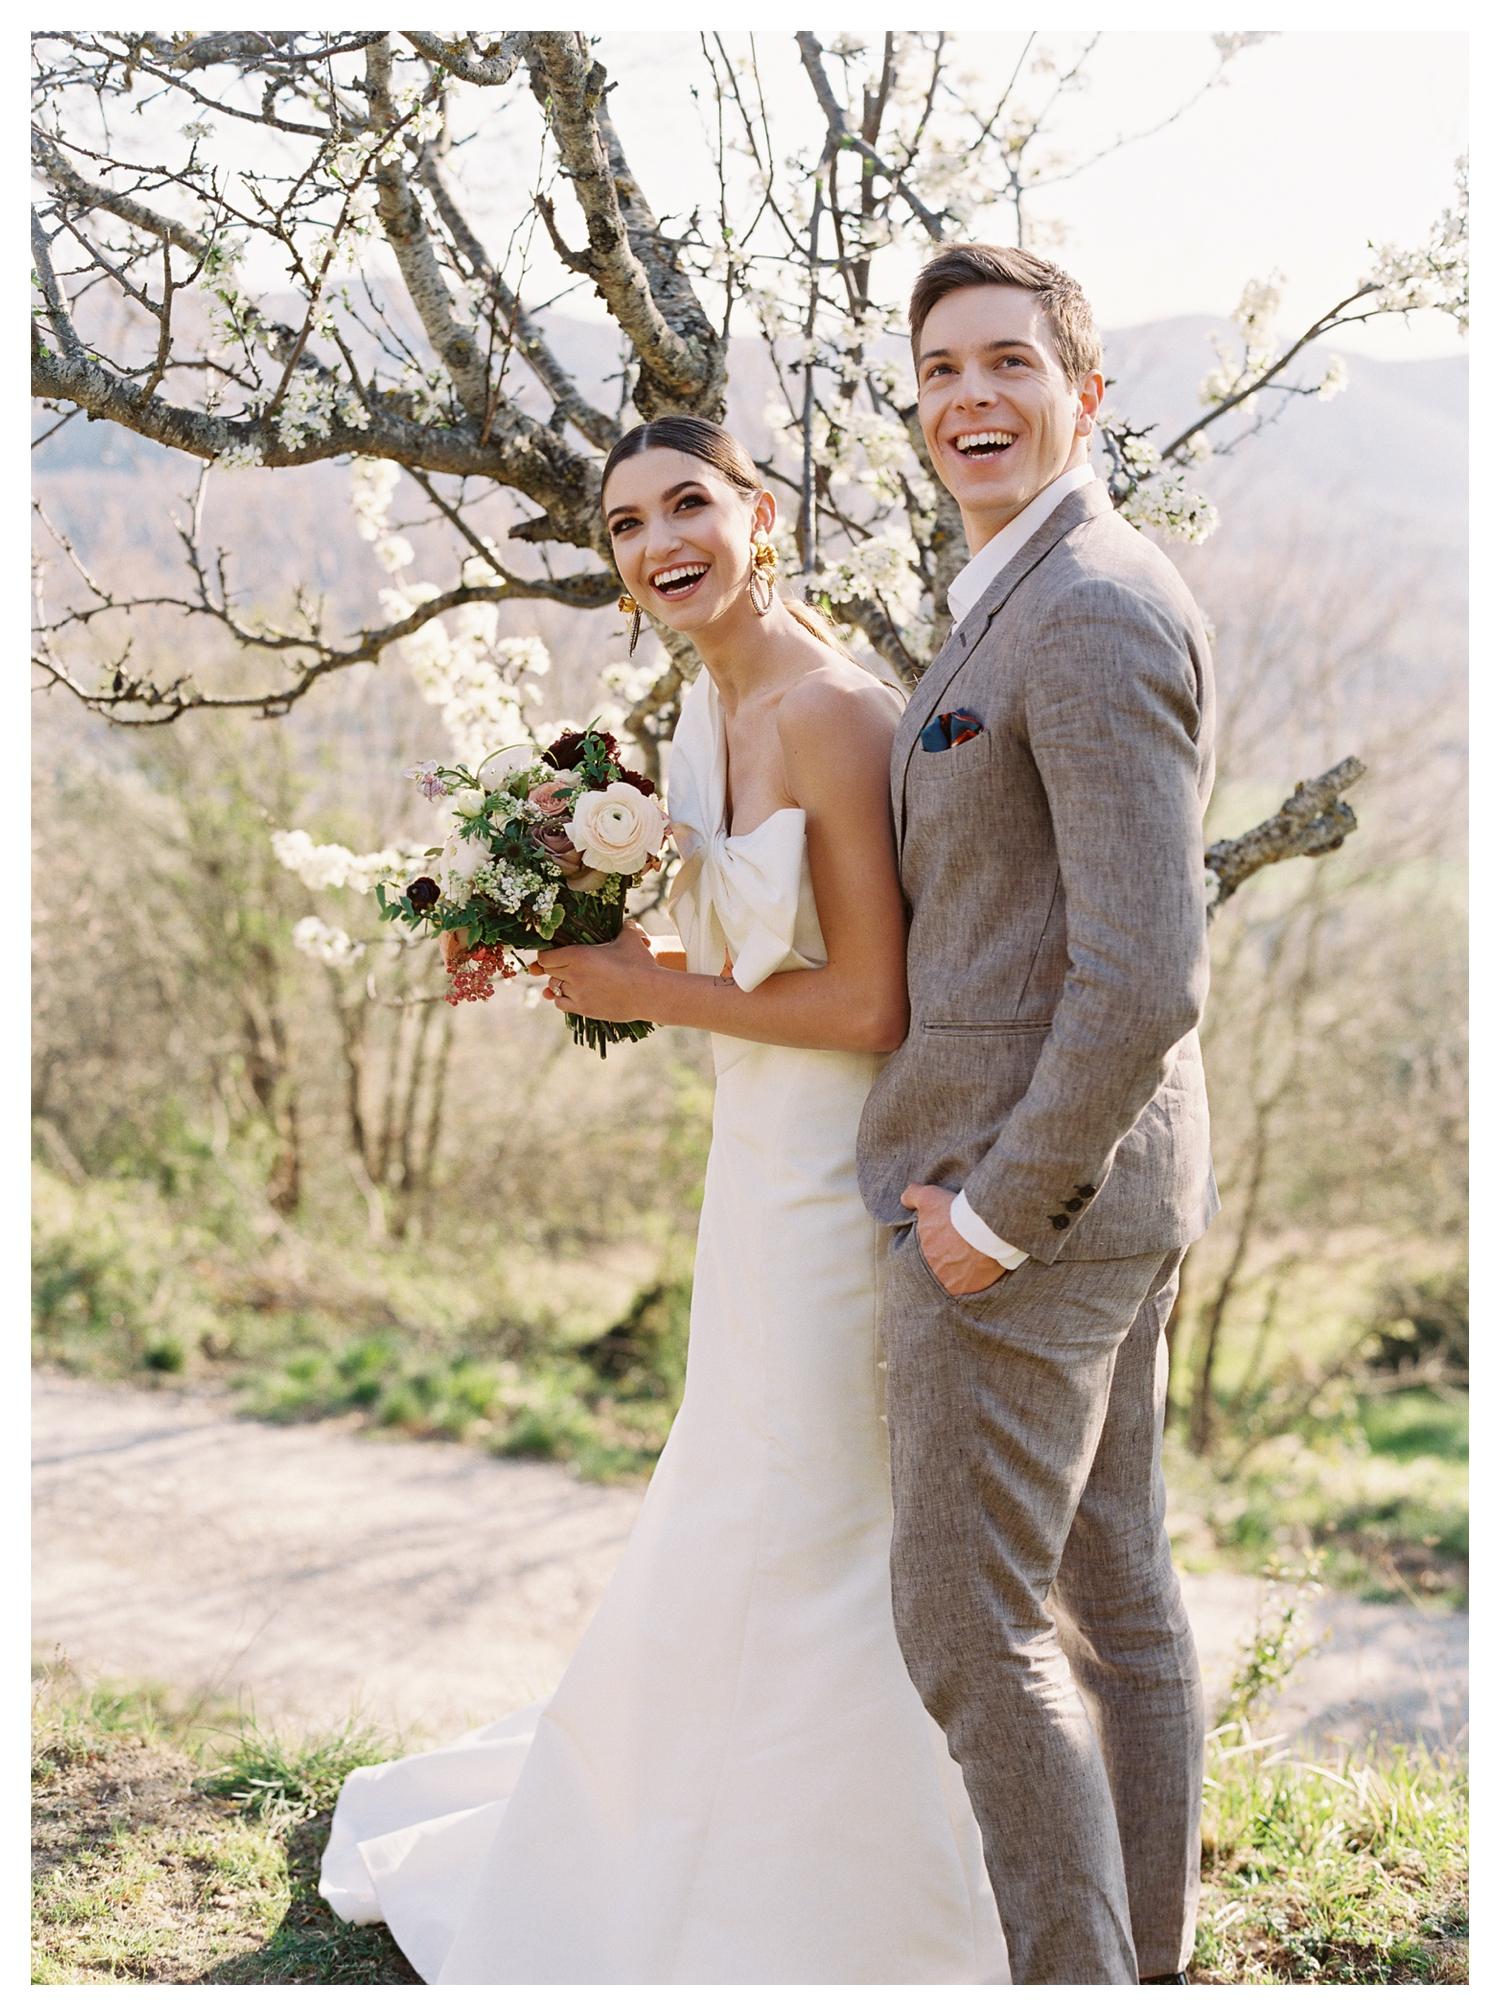 Villa-Montanare-wedding-tuscany-photographer_0012.jpg